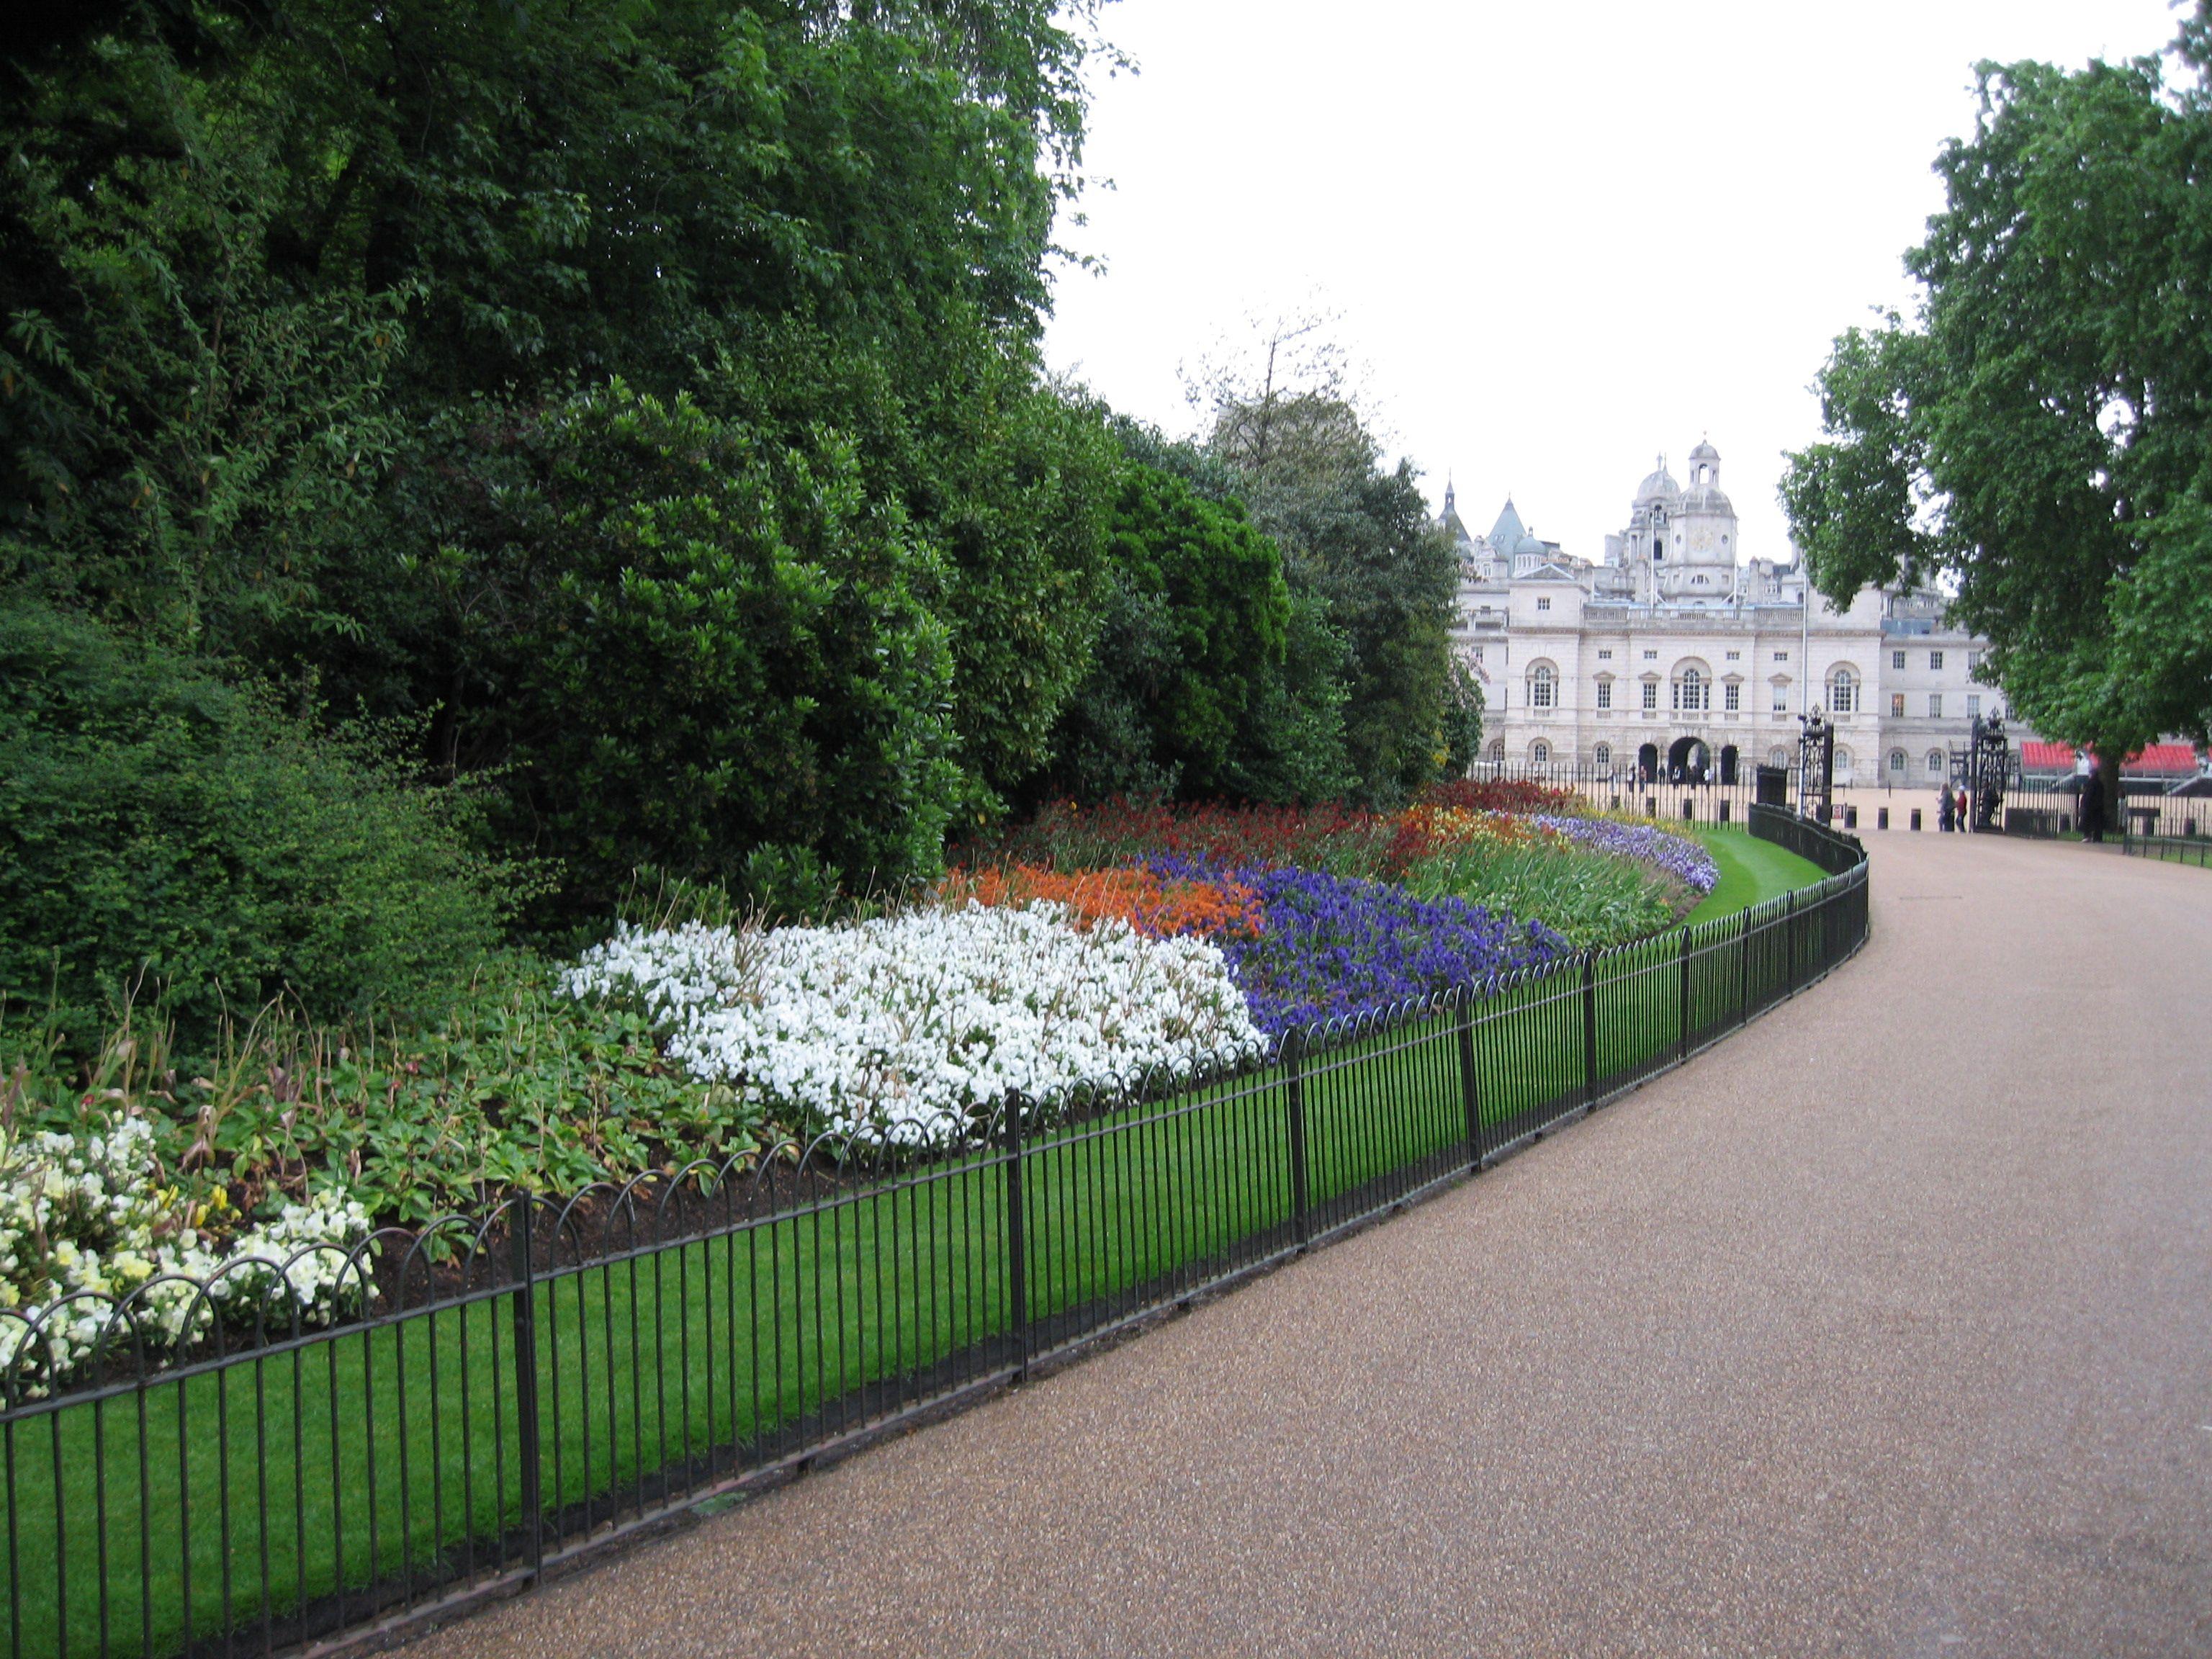 St. James's Park, looking west toward Horseguards, London